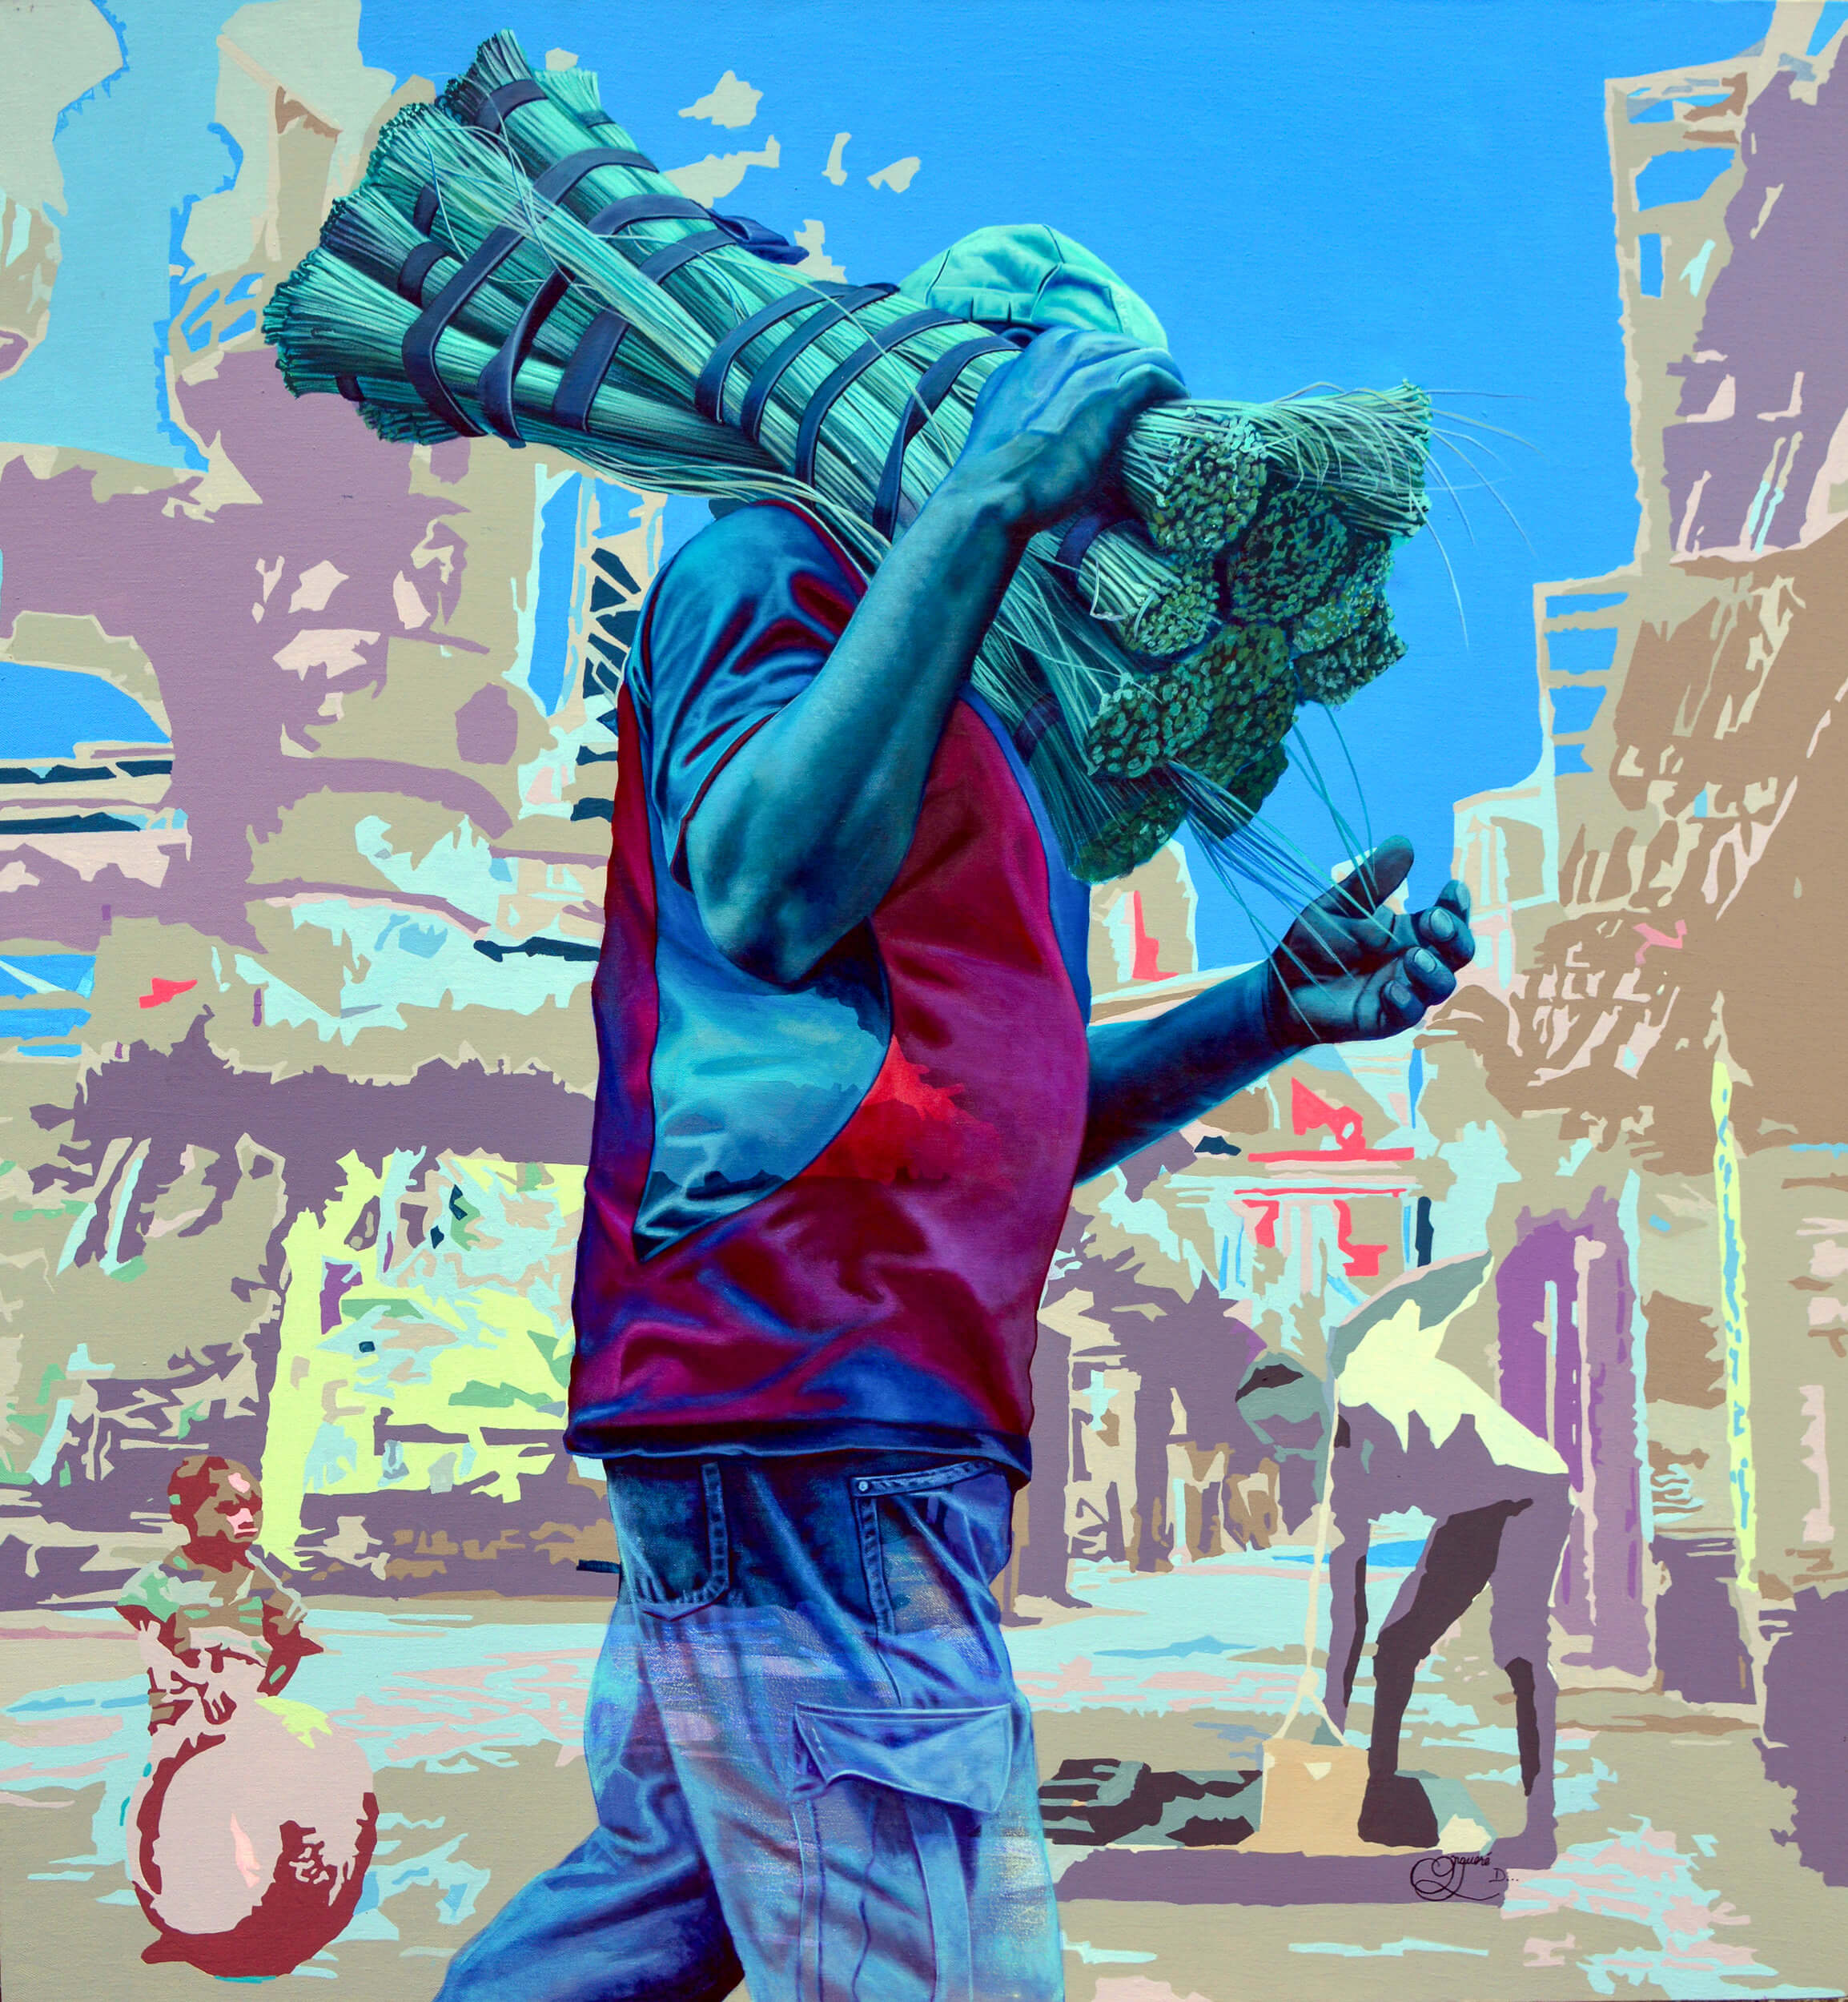 artsy-Daniel Onguene - Passage de Balais - 2020- 120cm H x 110cm W - Acrylic on canvas - Courtesy by OOA Gallery-2010